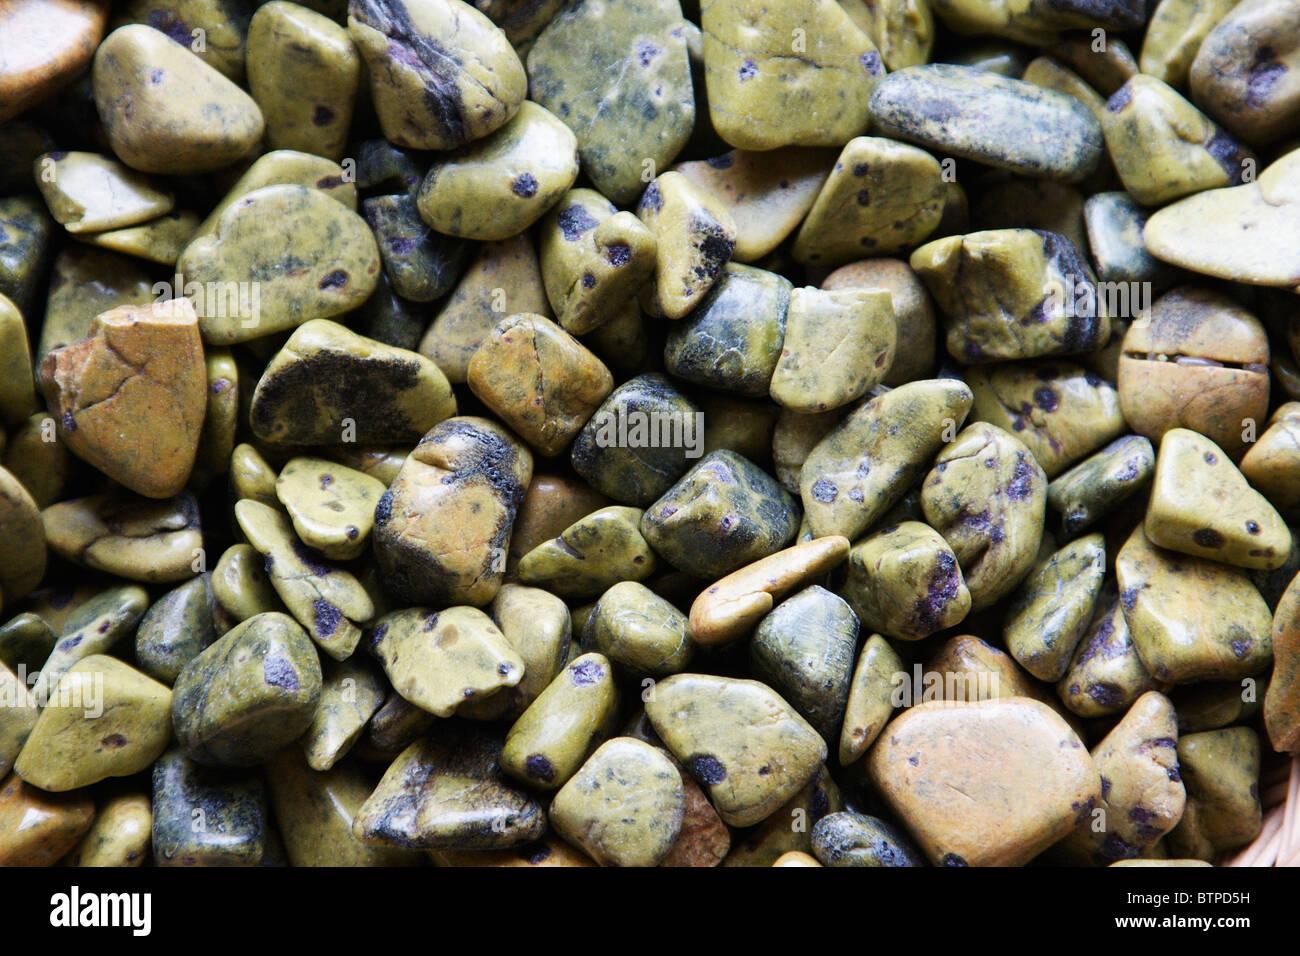 Australia, Tasmania, North-West, Zeehan, Stichtite pebbles - Stock Image